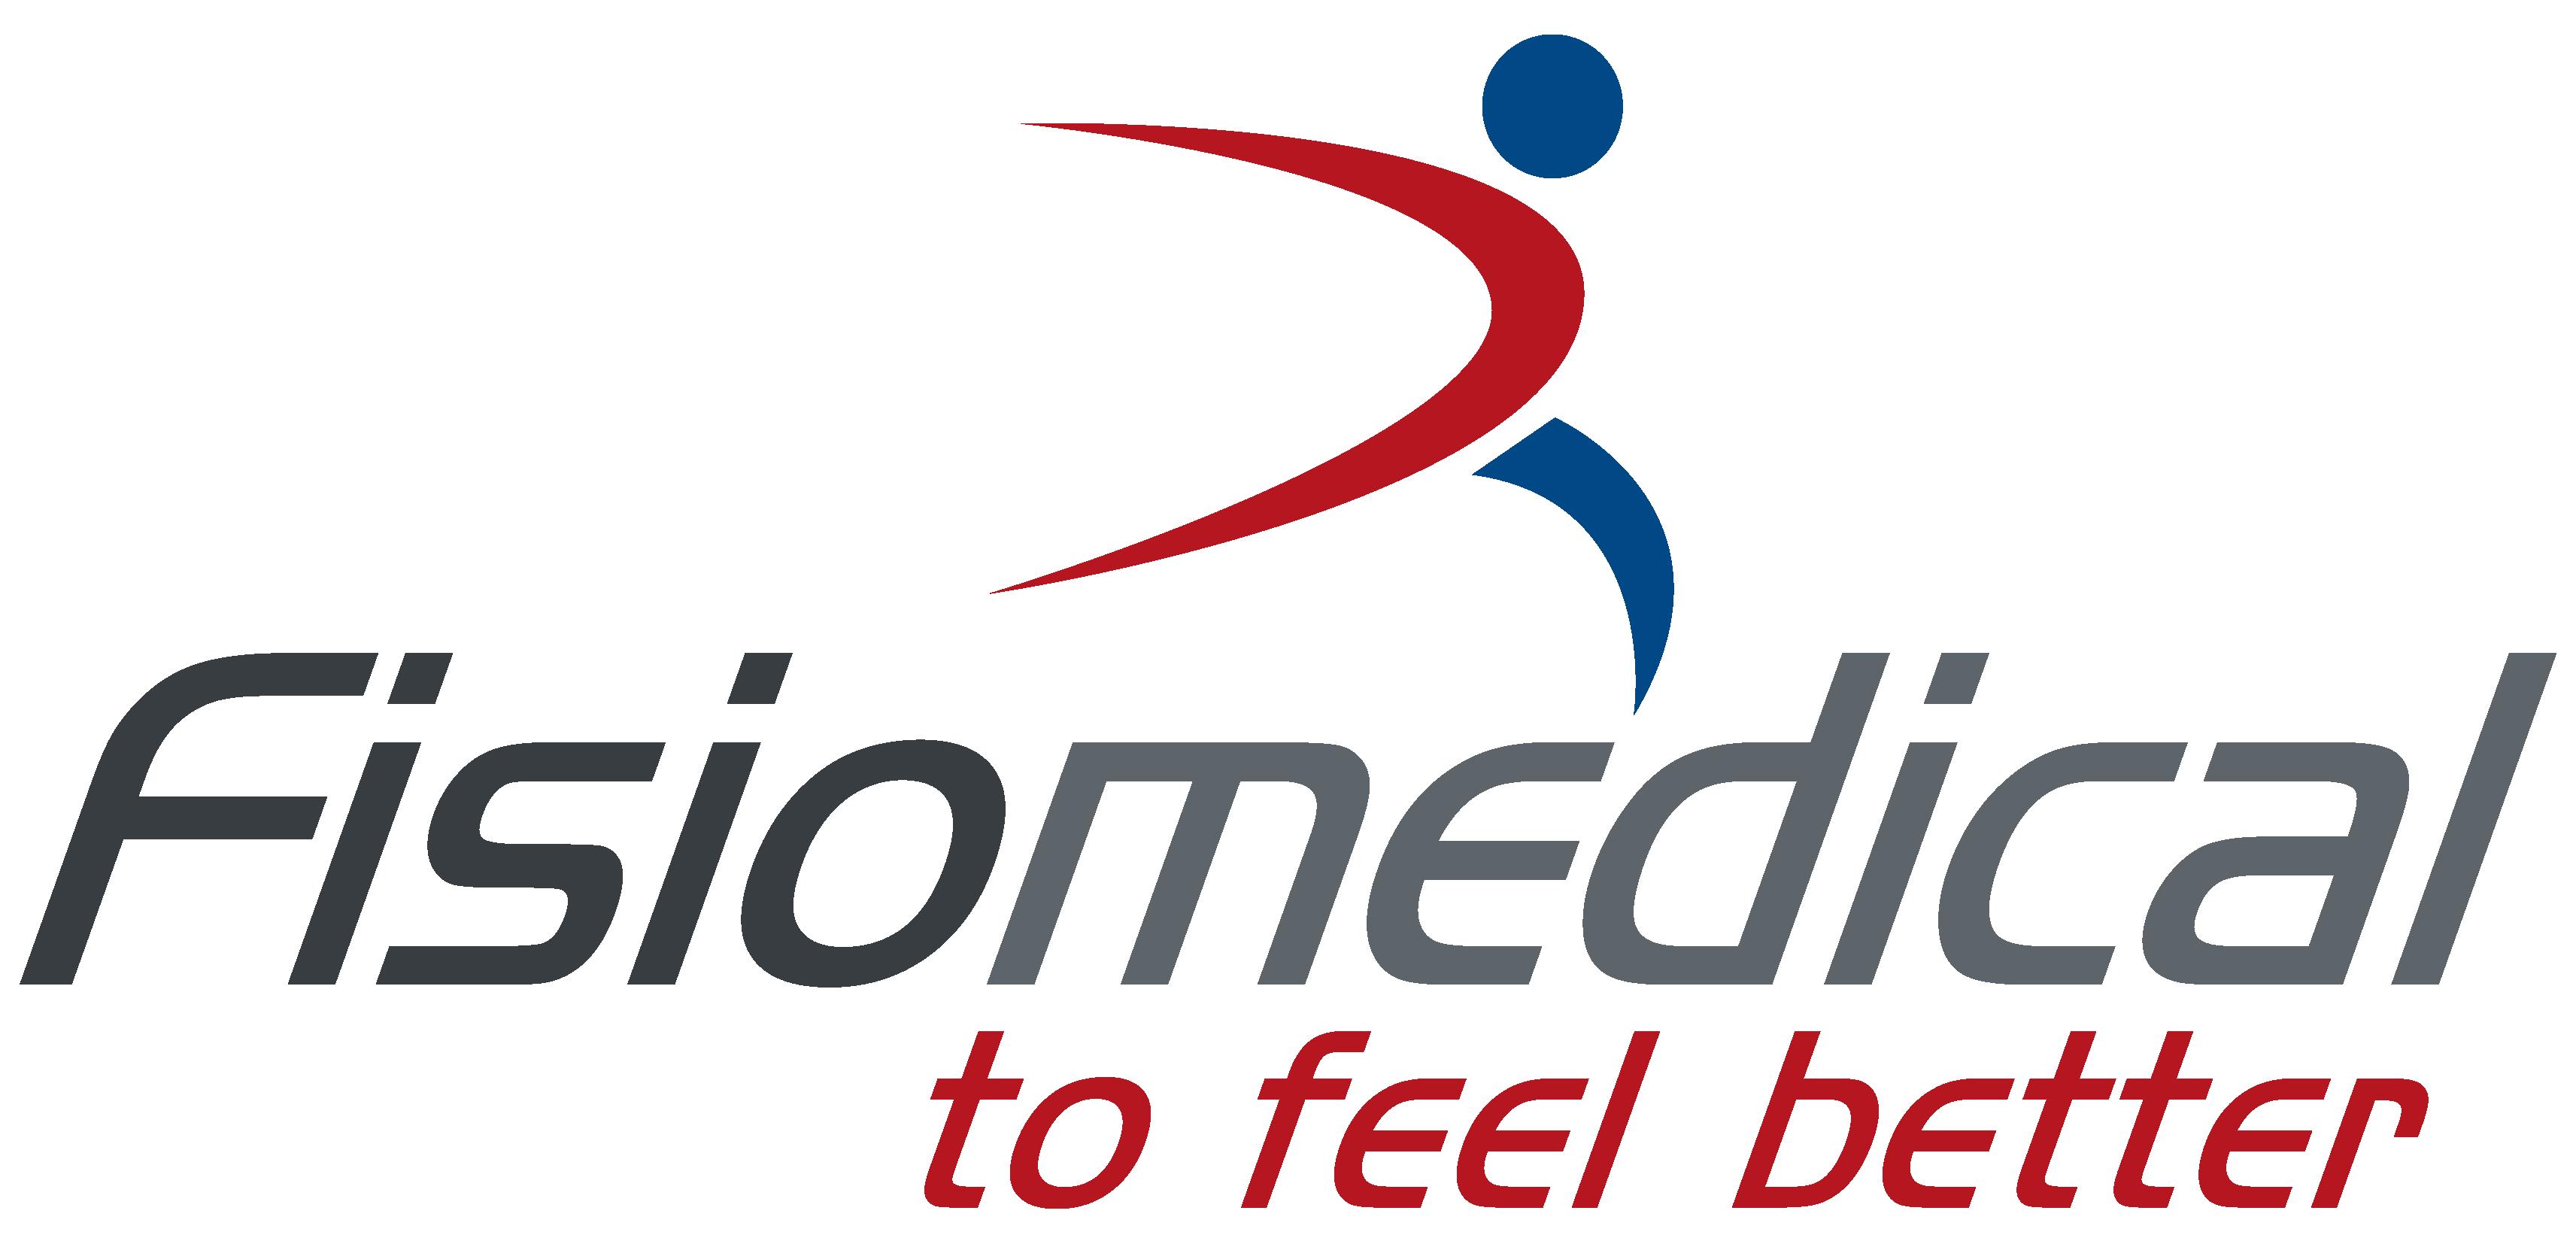 Fisiomedical